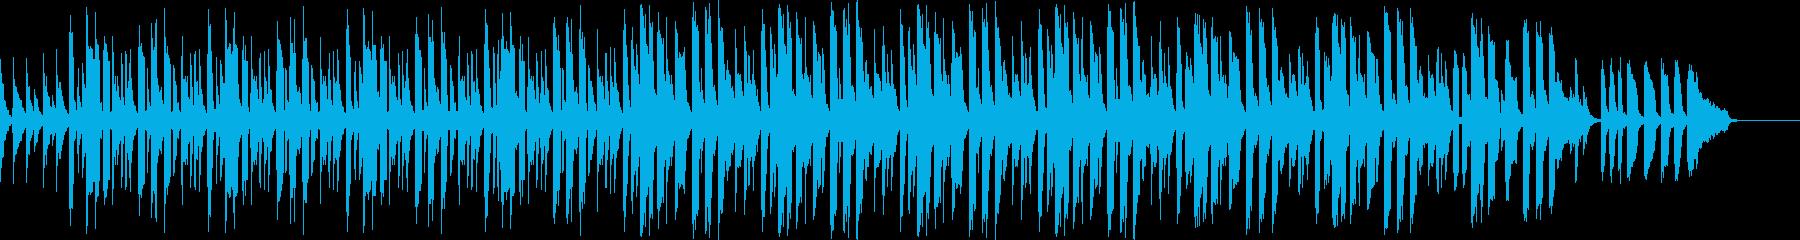 bpm80スローテンポバージョンの再生済みの波形